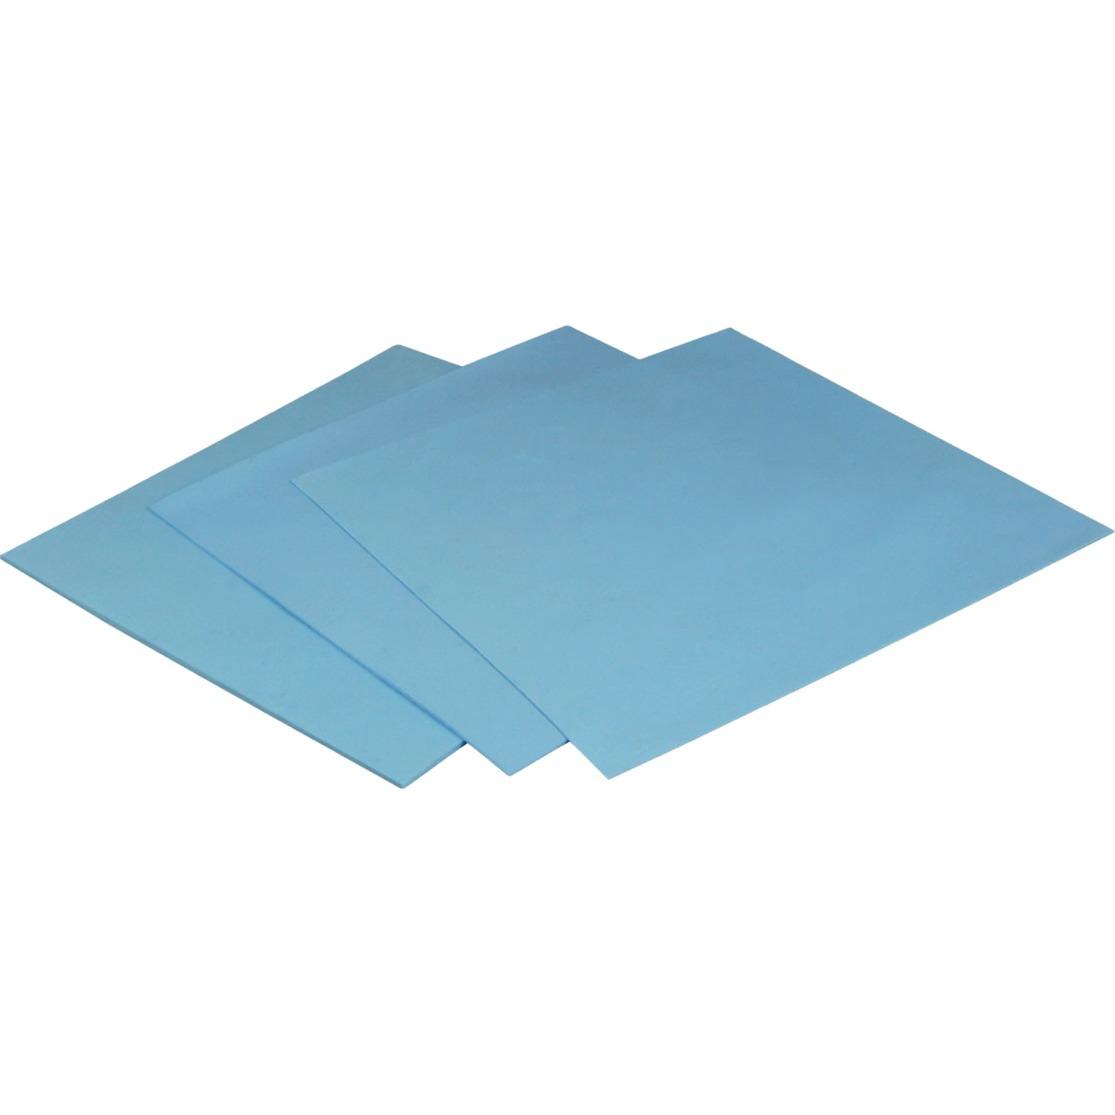 ACTPD00001A Azul hardware accesorio de refrigeración, Conductores térmicos (grasa/disco)